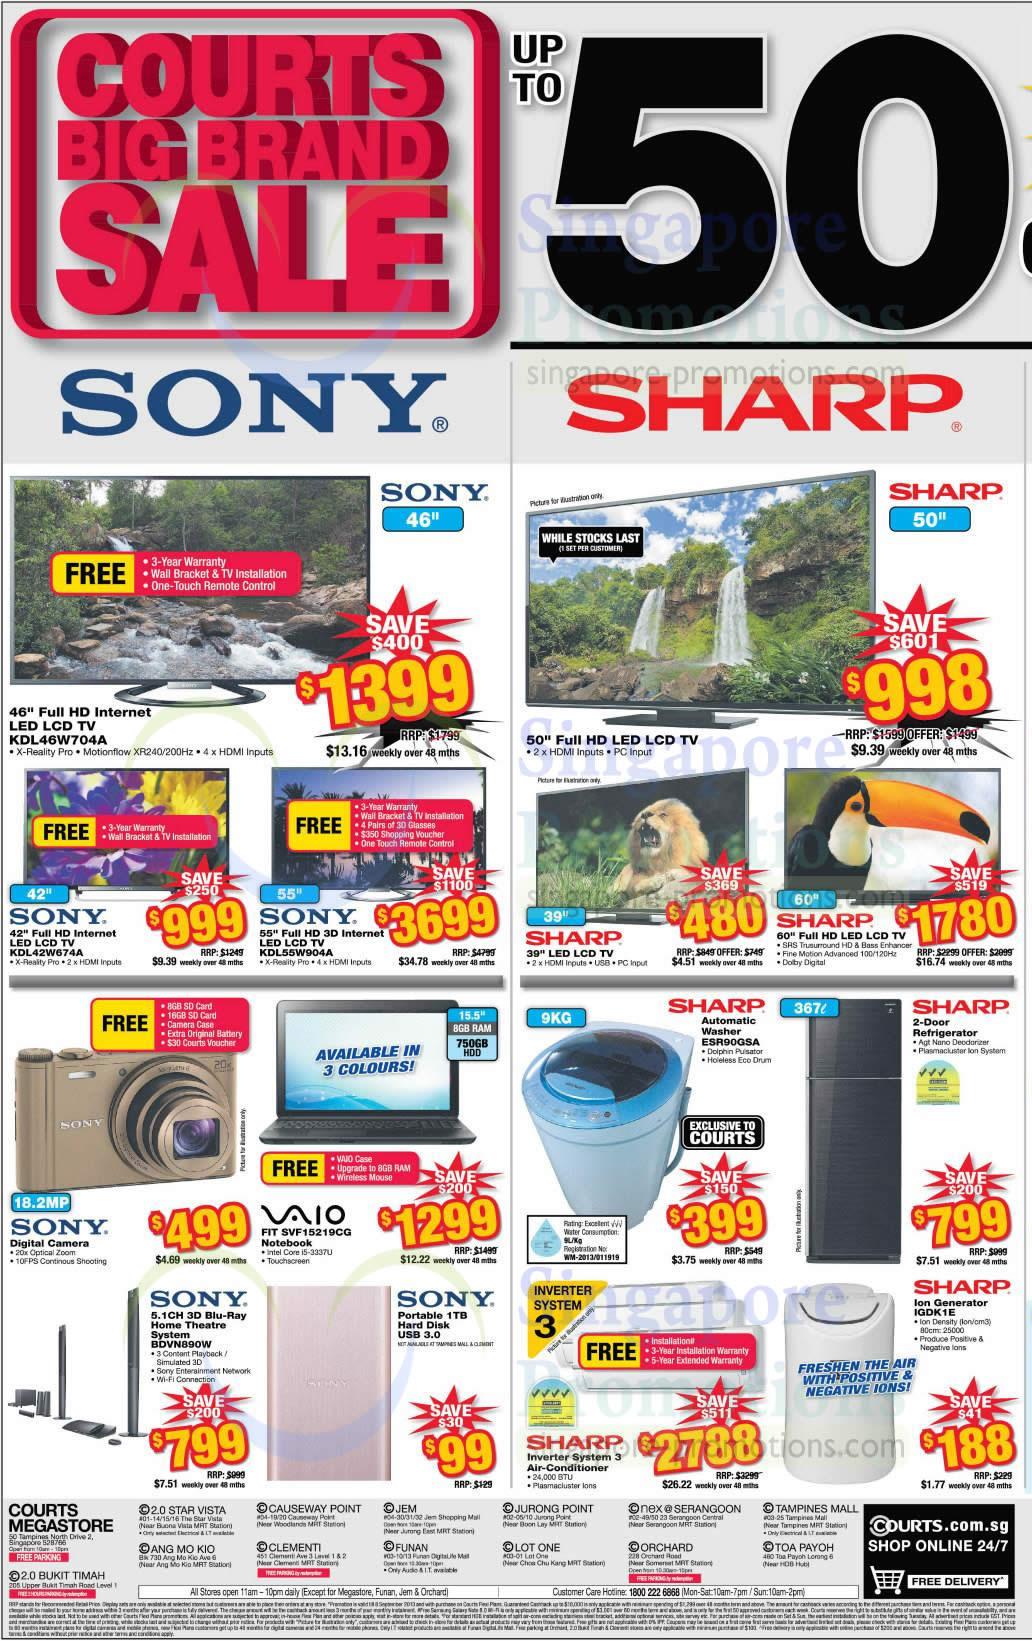 Sony KDL-46W704A TV, Sony KDL-42W674A TV, Sony KDL-55W904A TV, Sony Vaio SVF15219CG Notebook, Sony BDV-N890W Home Theatre System, Sharp ESR90GSA Washer and Sharp IGDK1E Ion Generator